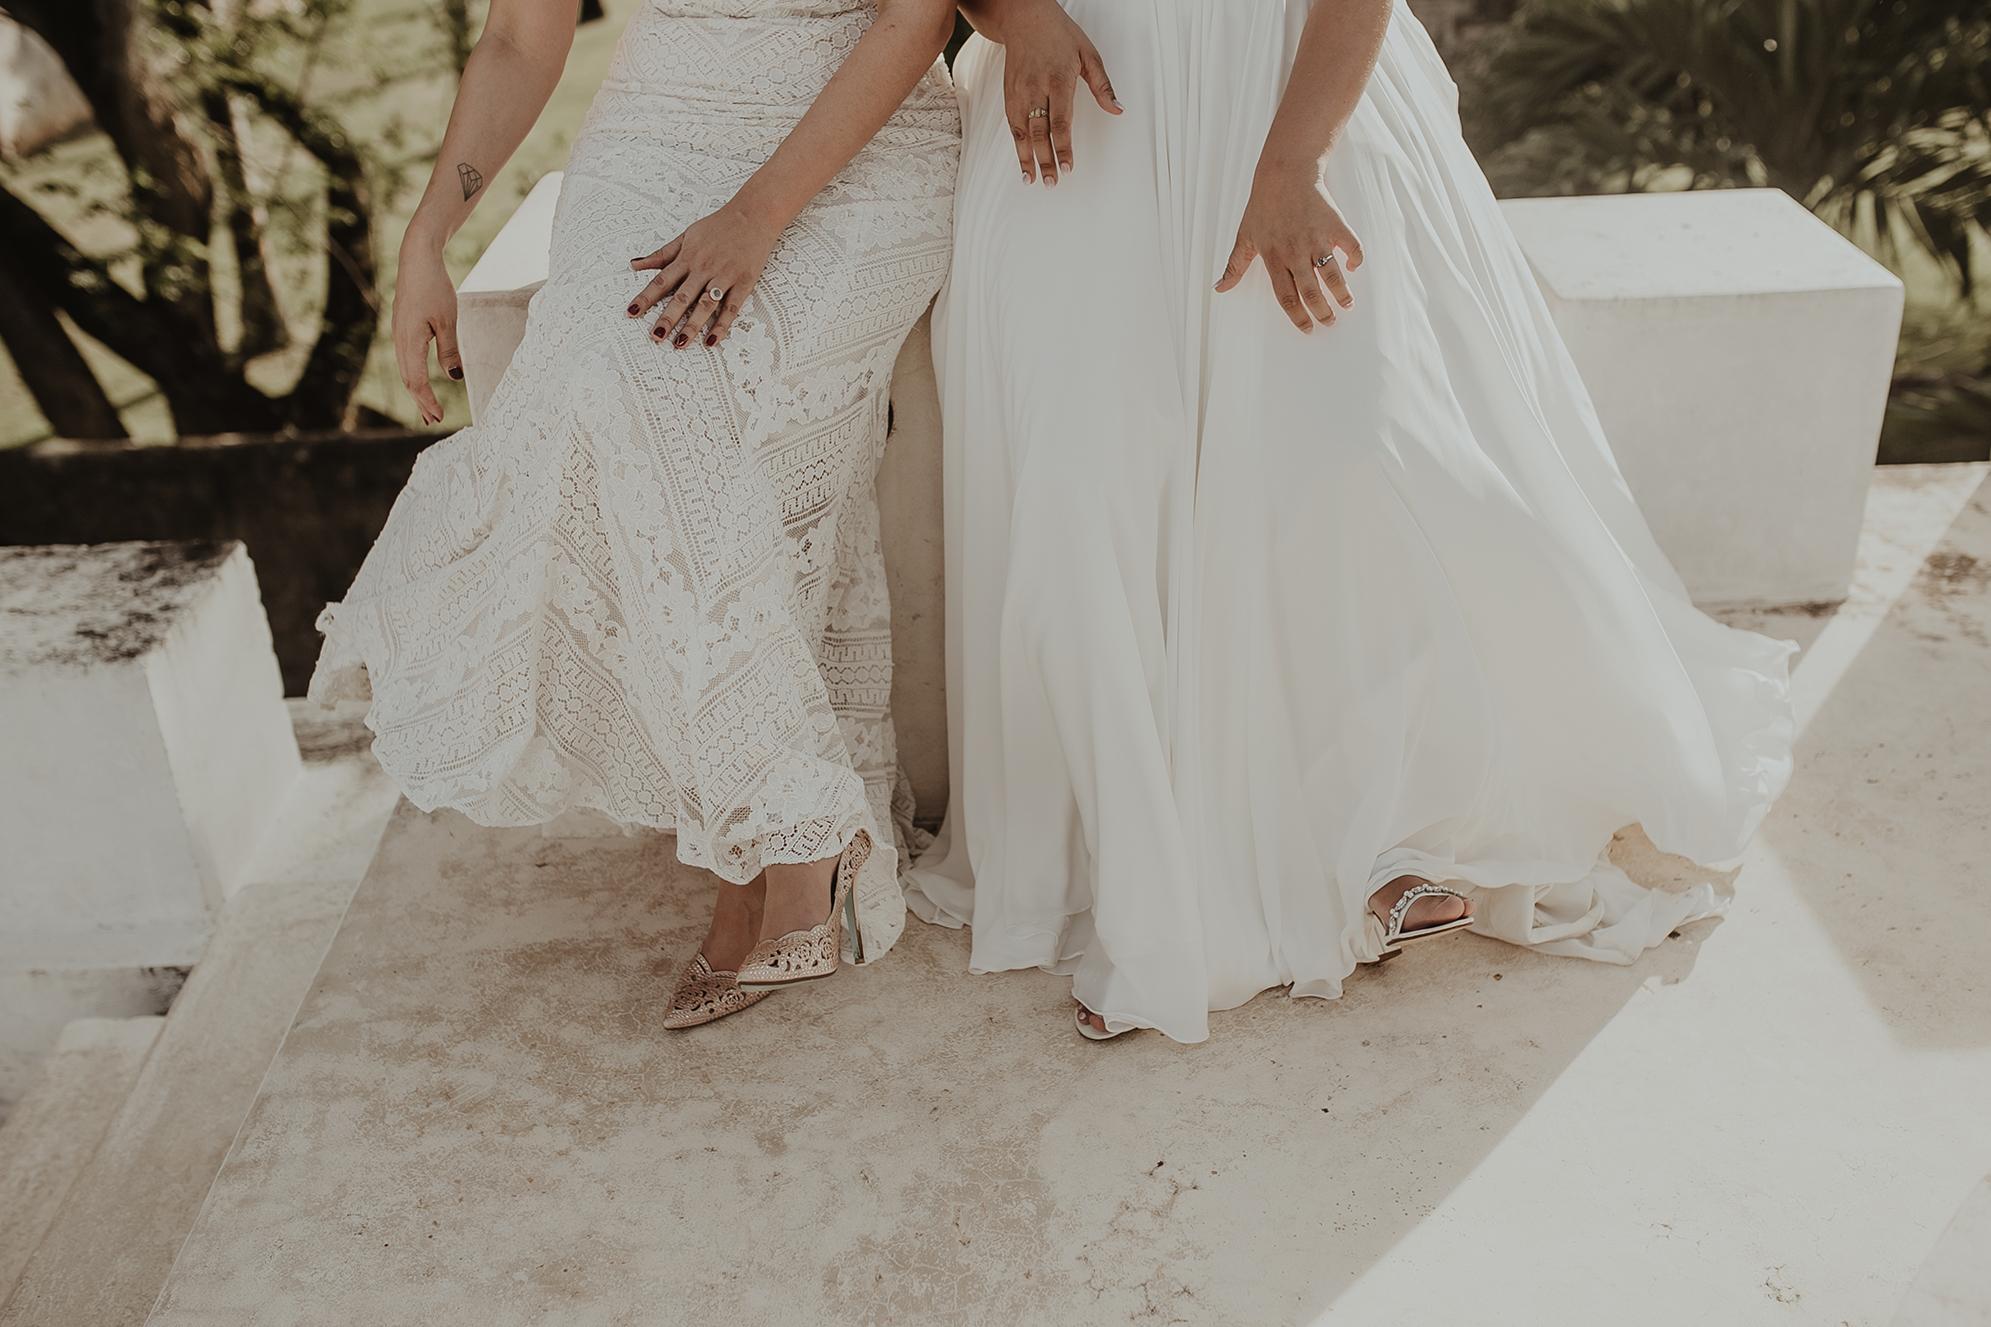 0205V&Aslide_HaciendaSacChic_WeddingGay_WeddingDstination_MeridaYucatan_HaciendasMerida_BodasMexico_BodasYucatan_Boda_Destino.jpg